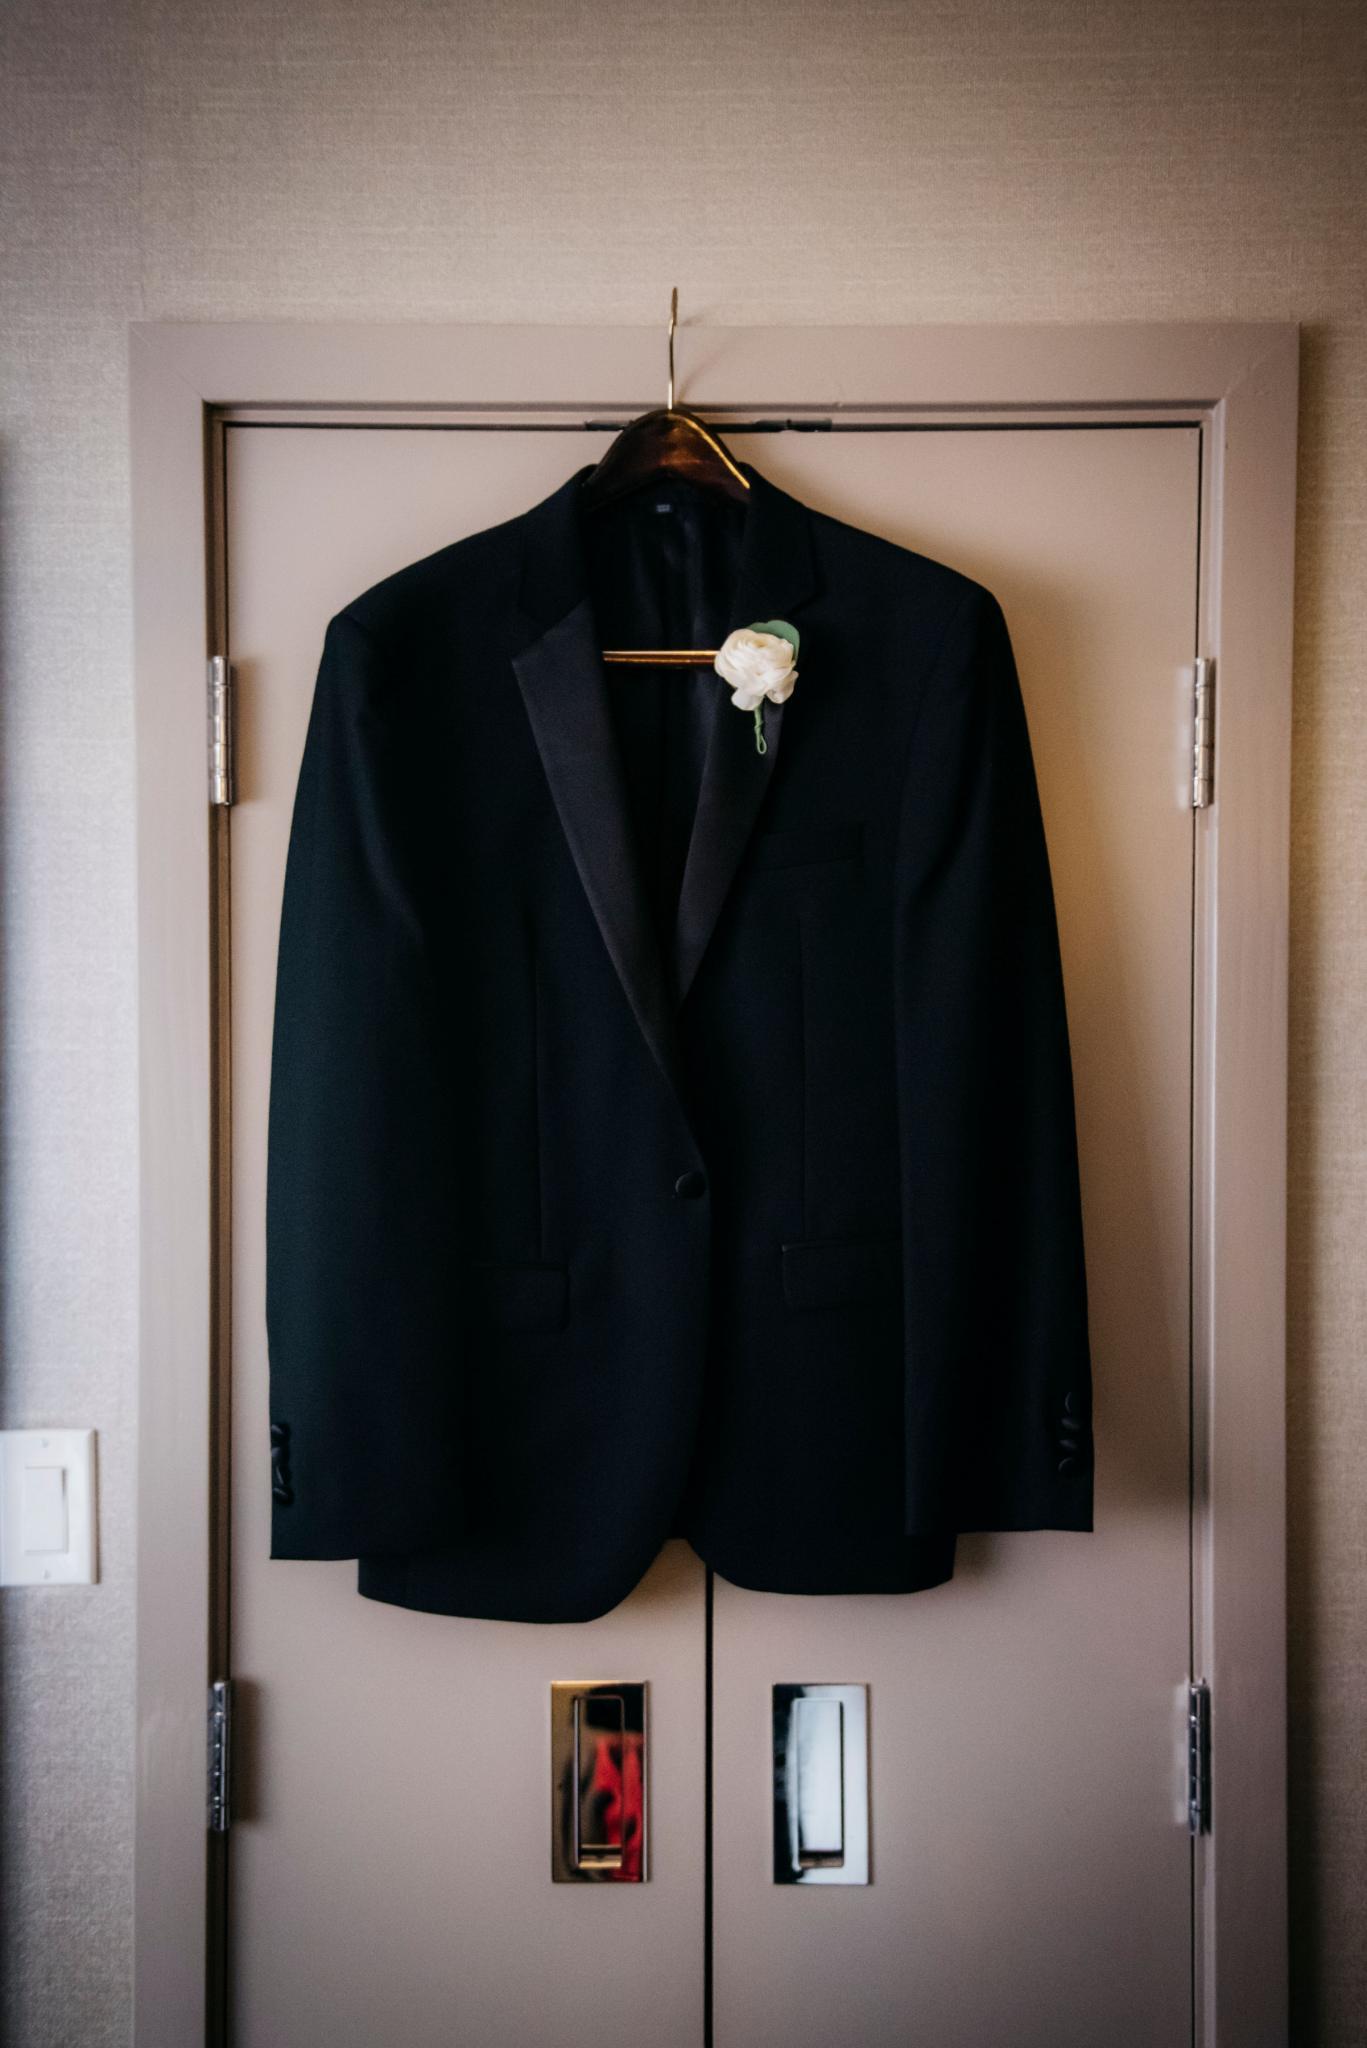 annie tommy venue SIX10 chicago, il wedding groom getting ready details